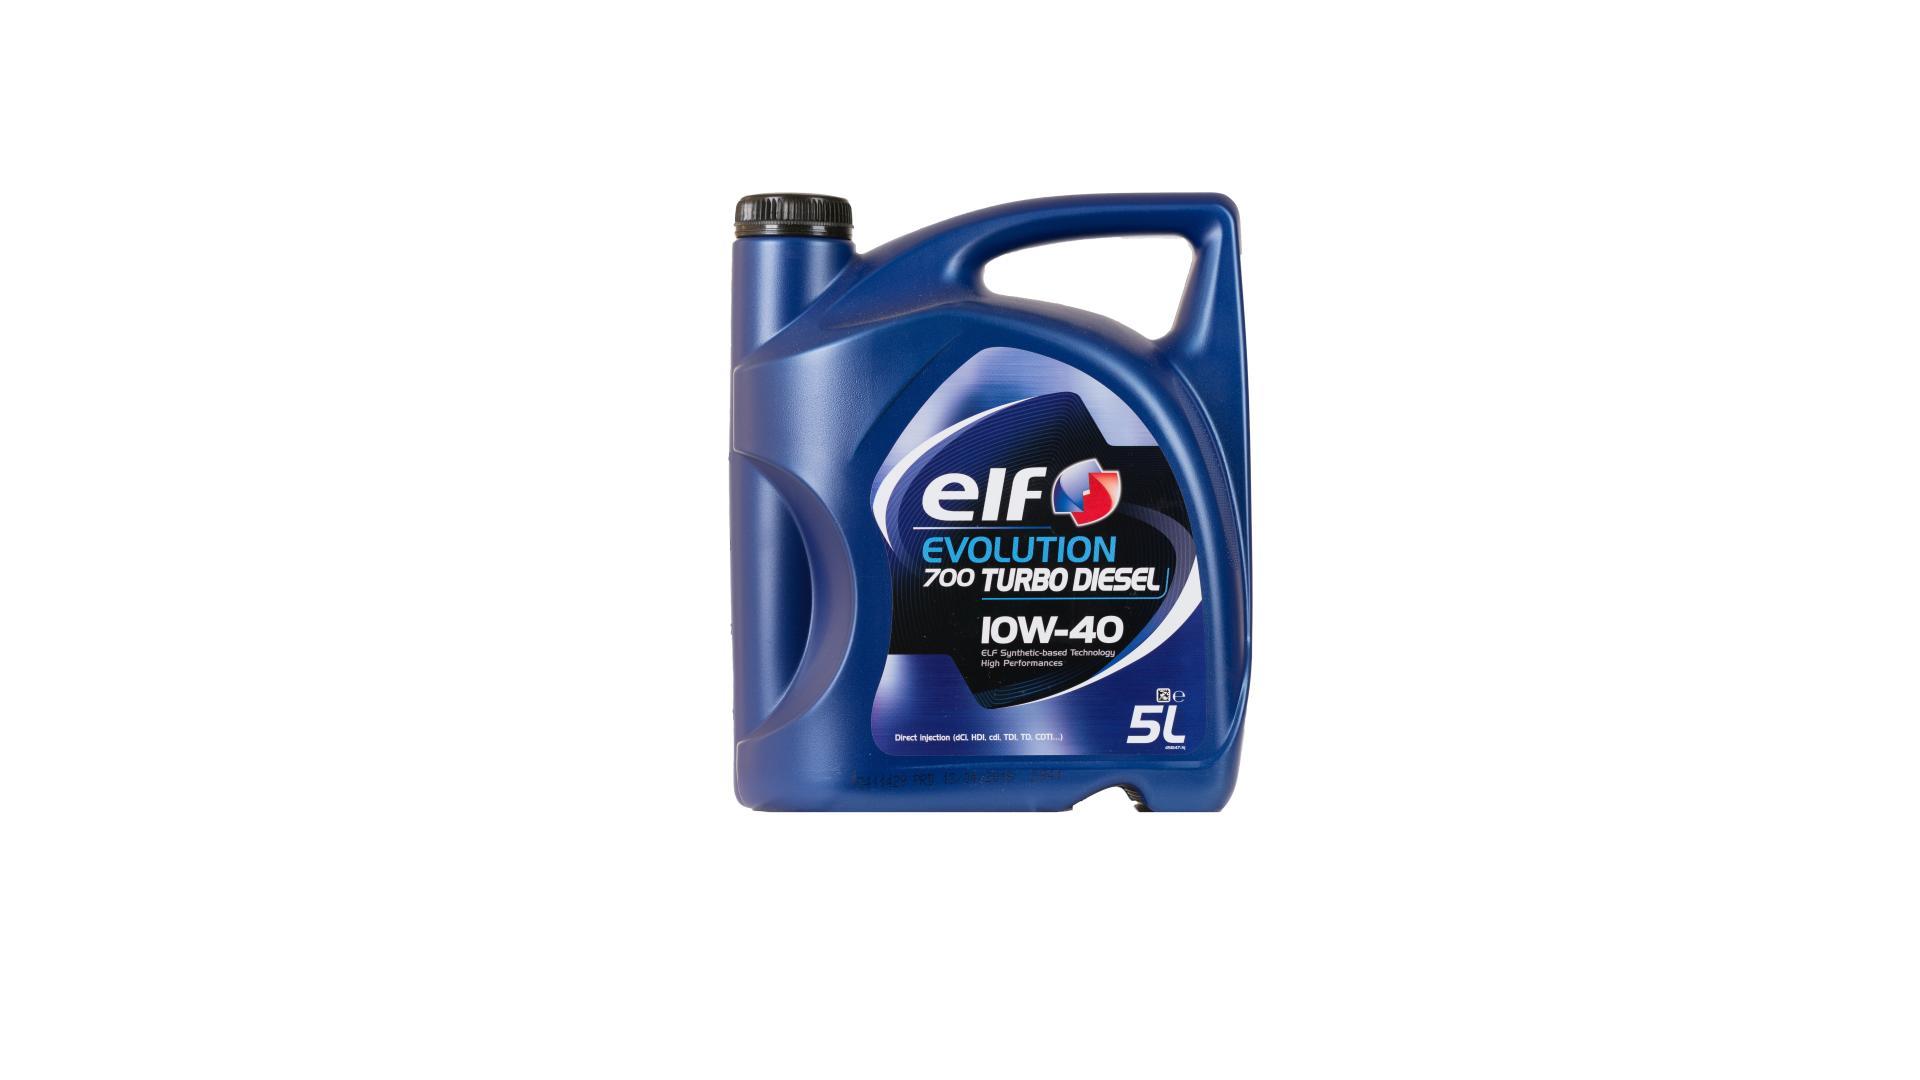 Elf 10w-40 Evolution 700 TD 5L (201553)